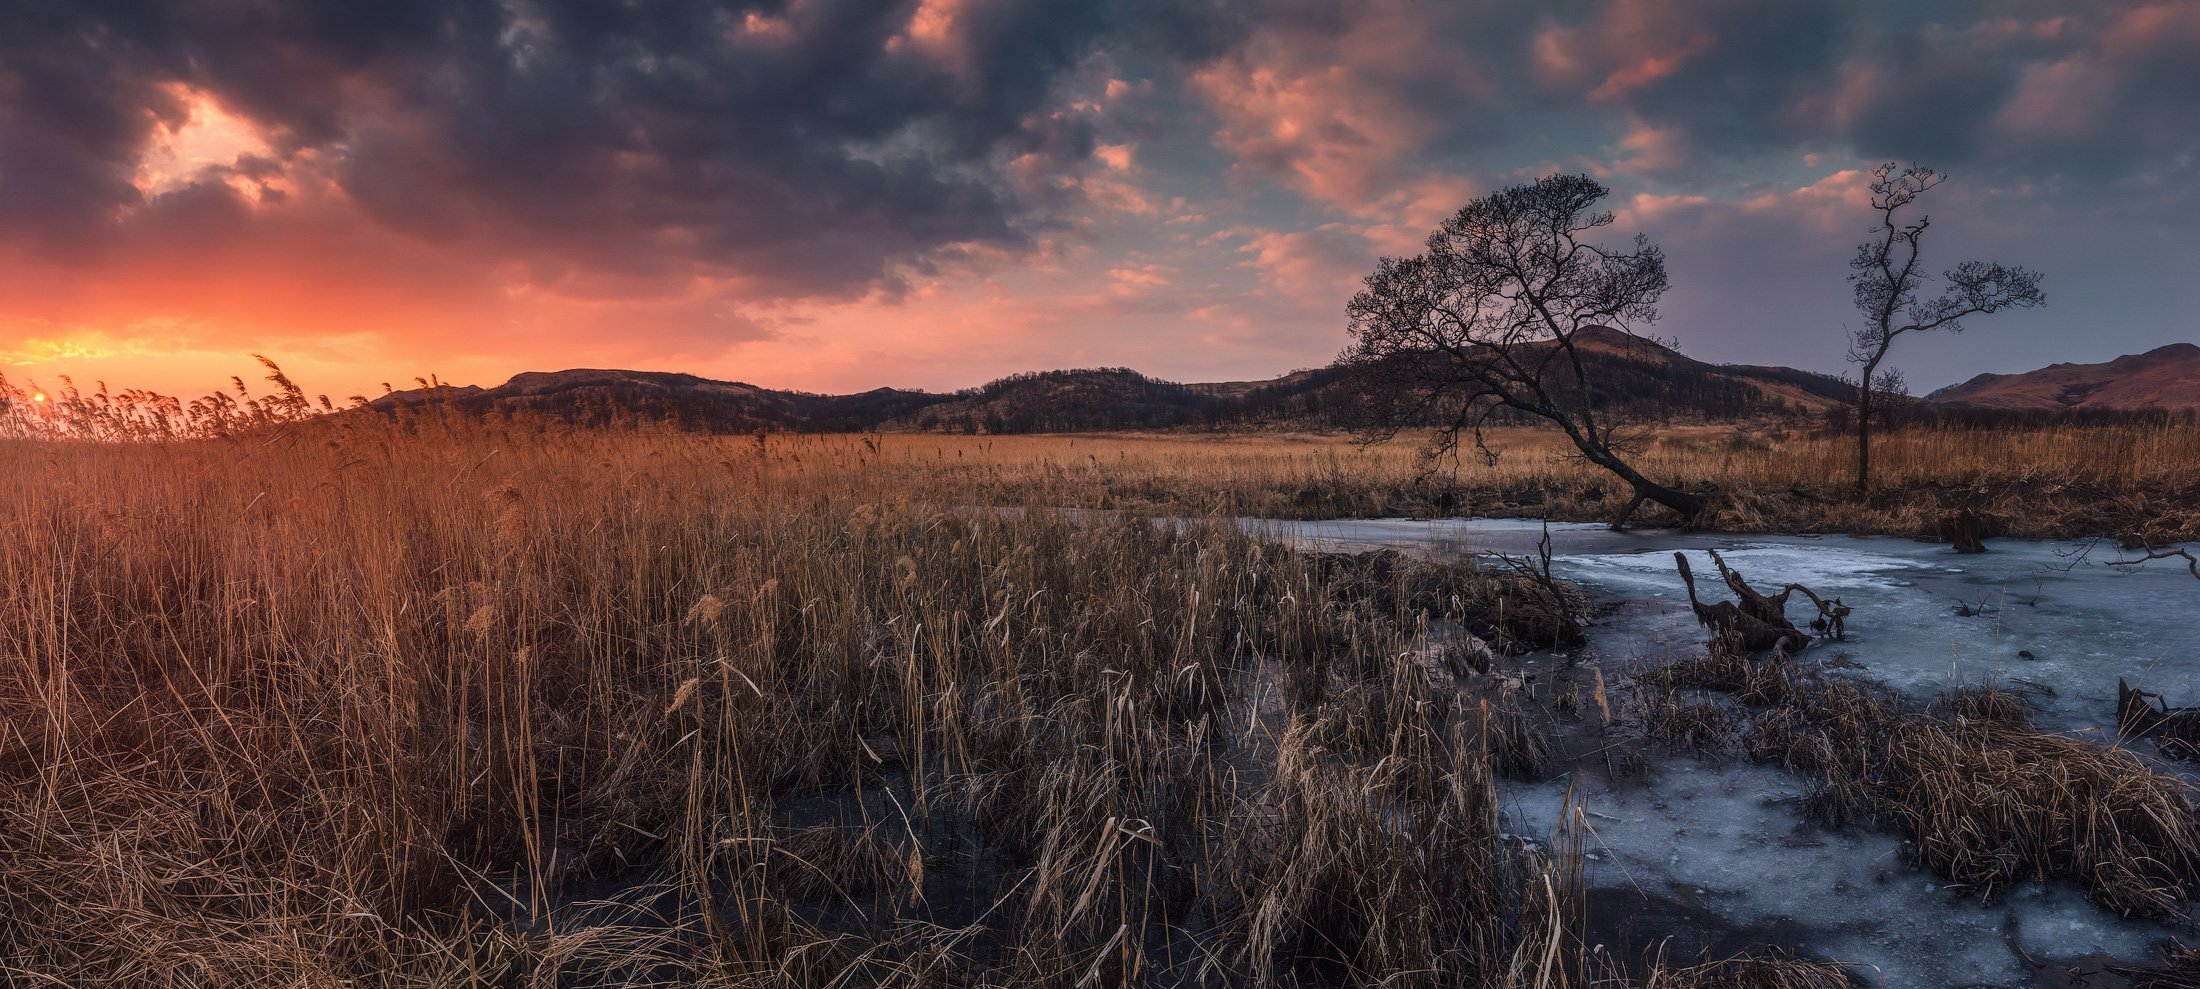 панорама, весна, закат, Андрей Кровлин